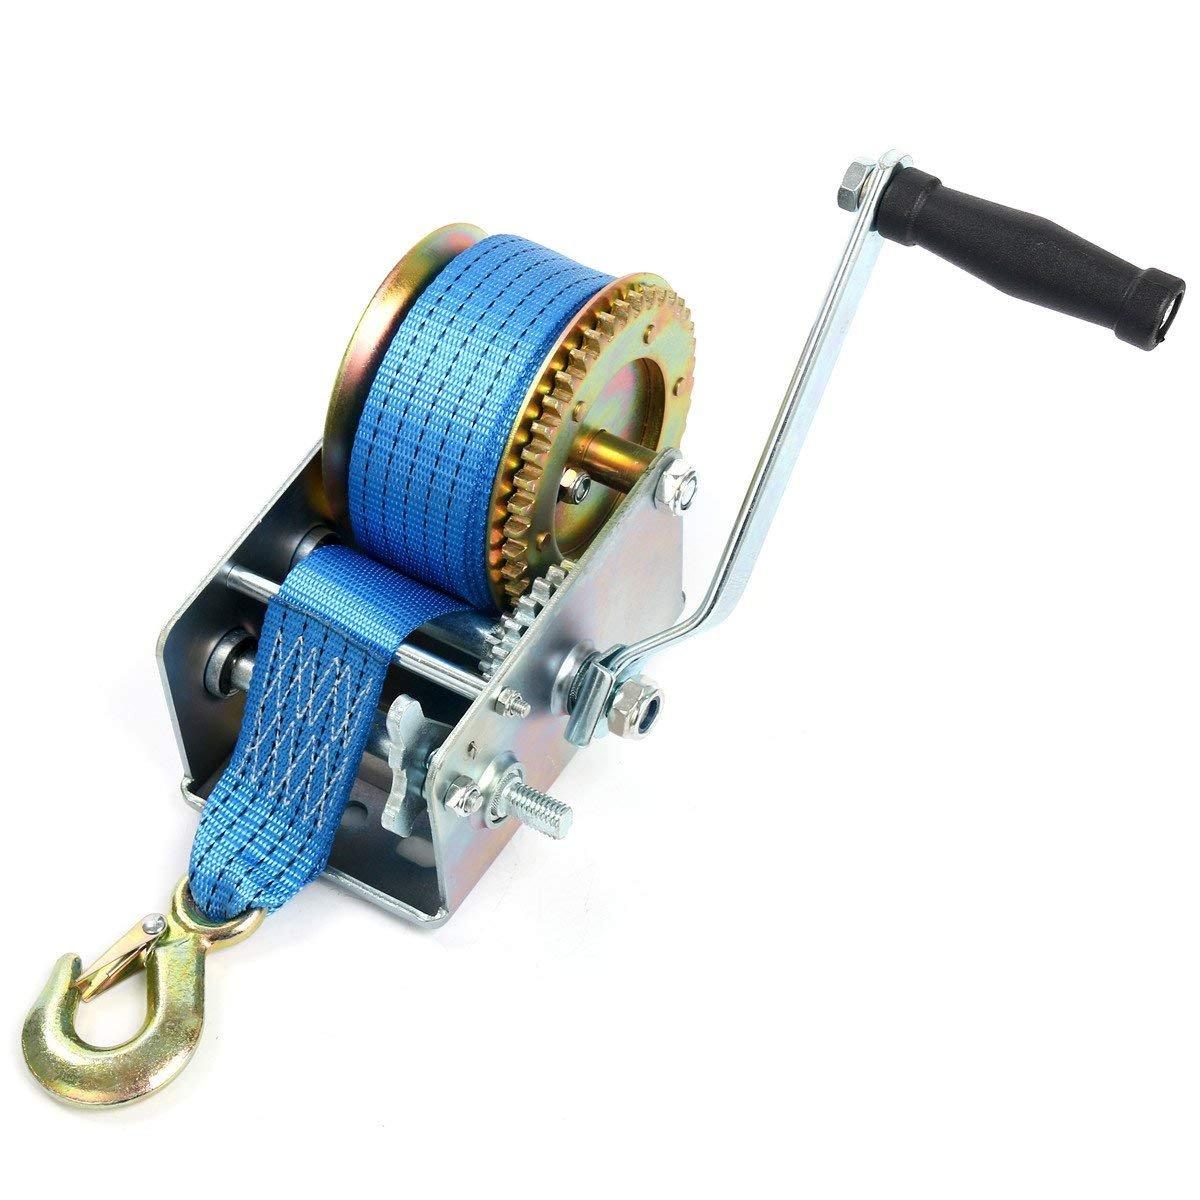 8milelake 1000lbs Hand Winch Hand Crank Strap Gear Winch Polyester Strap ATV Boat Trailer Heavy Duty freebirdtrading